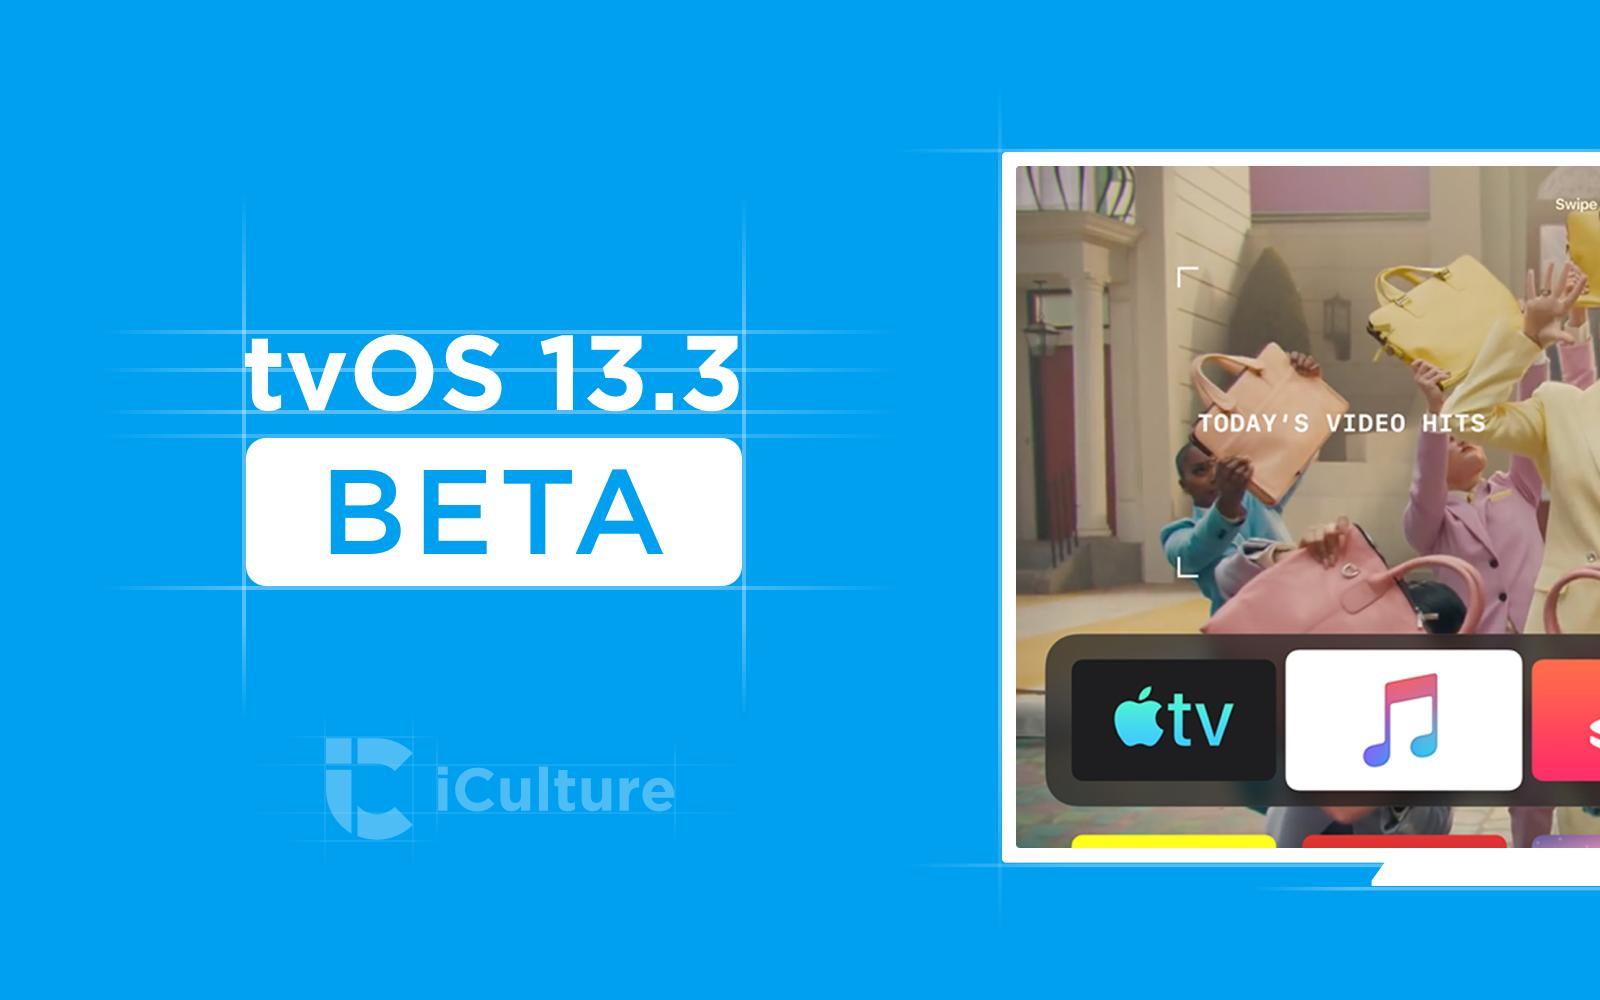 tvOS 13.3 beta.